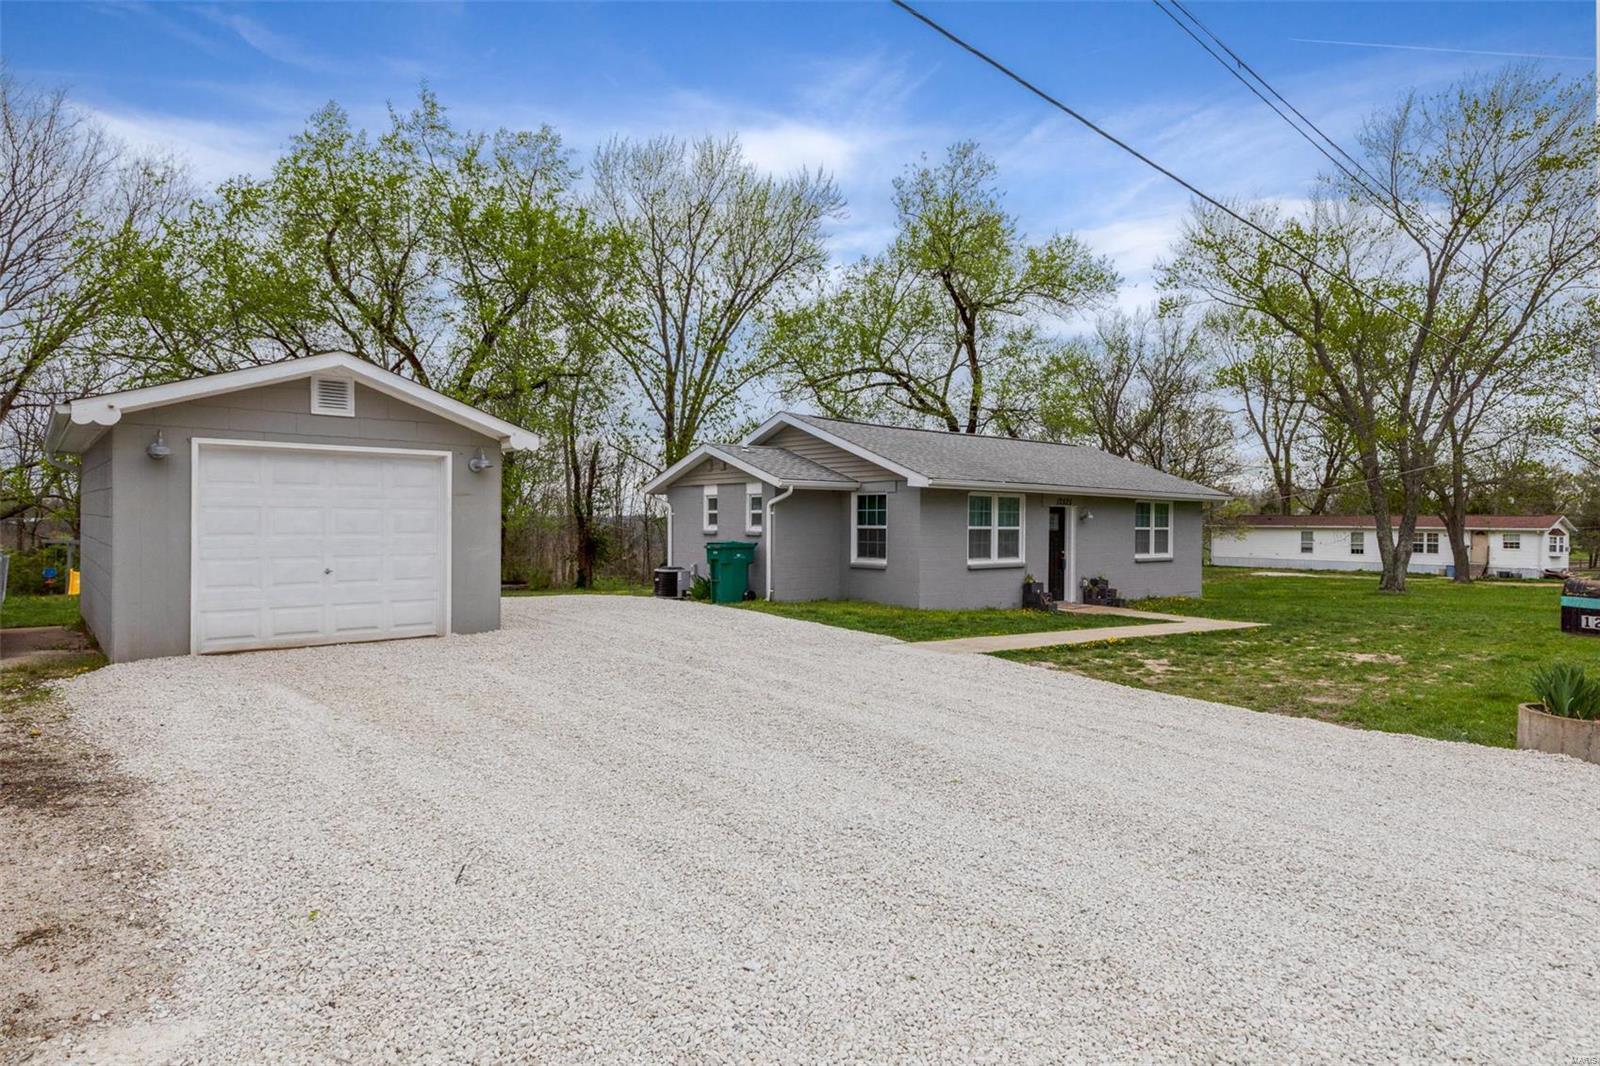 12525 State Road Cc Property Photo - Festus, MO real estate listing